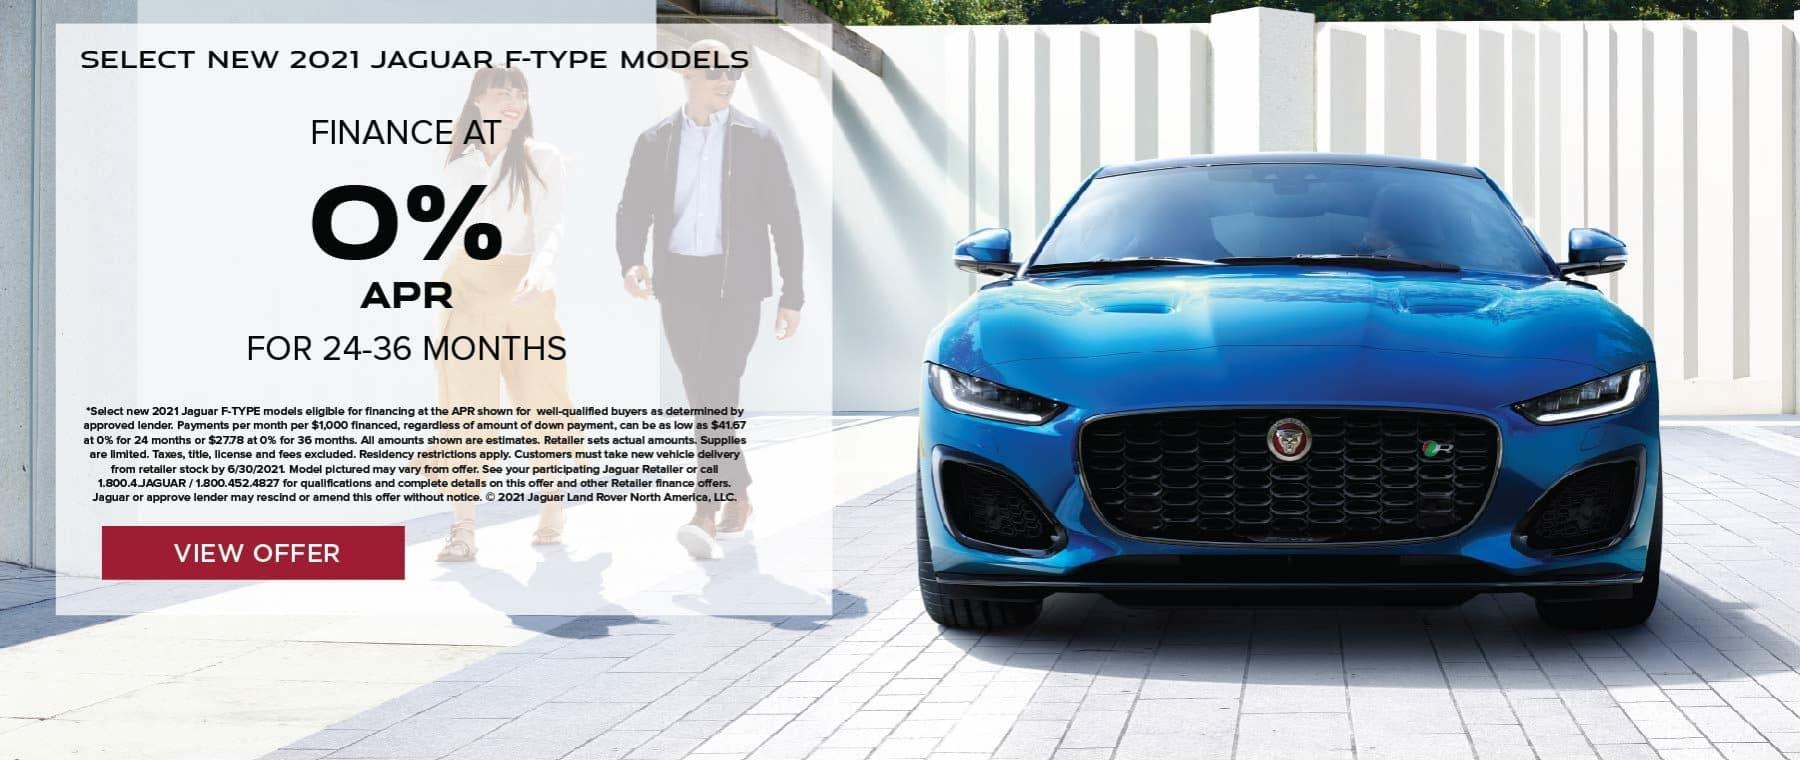 North Scottsdale – Jaguar – Homepage Slides (Offers)_2021 F-TYPE – APR